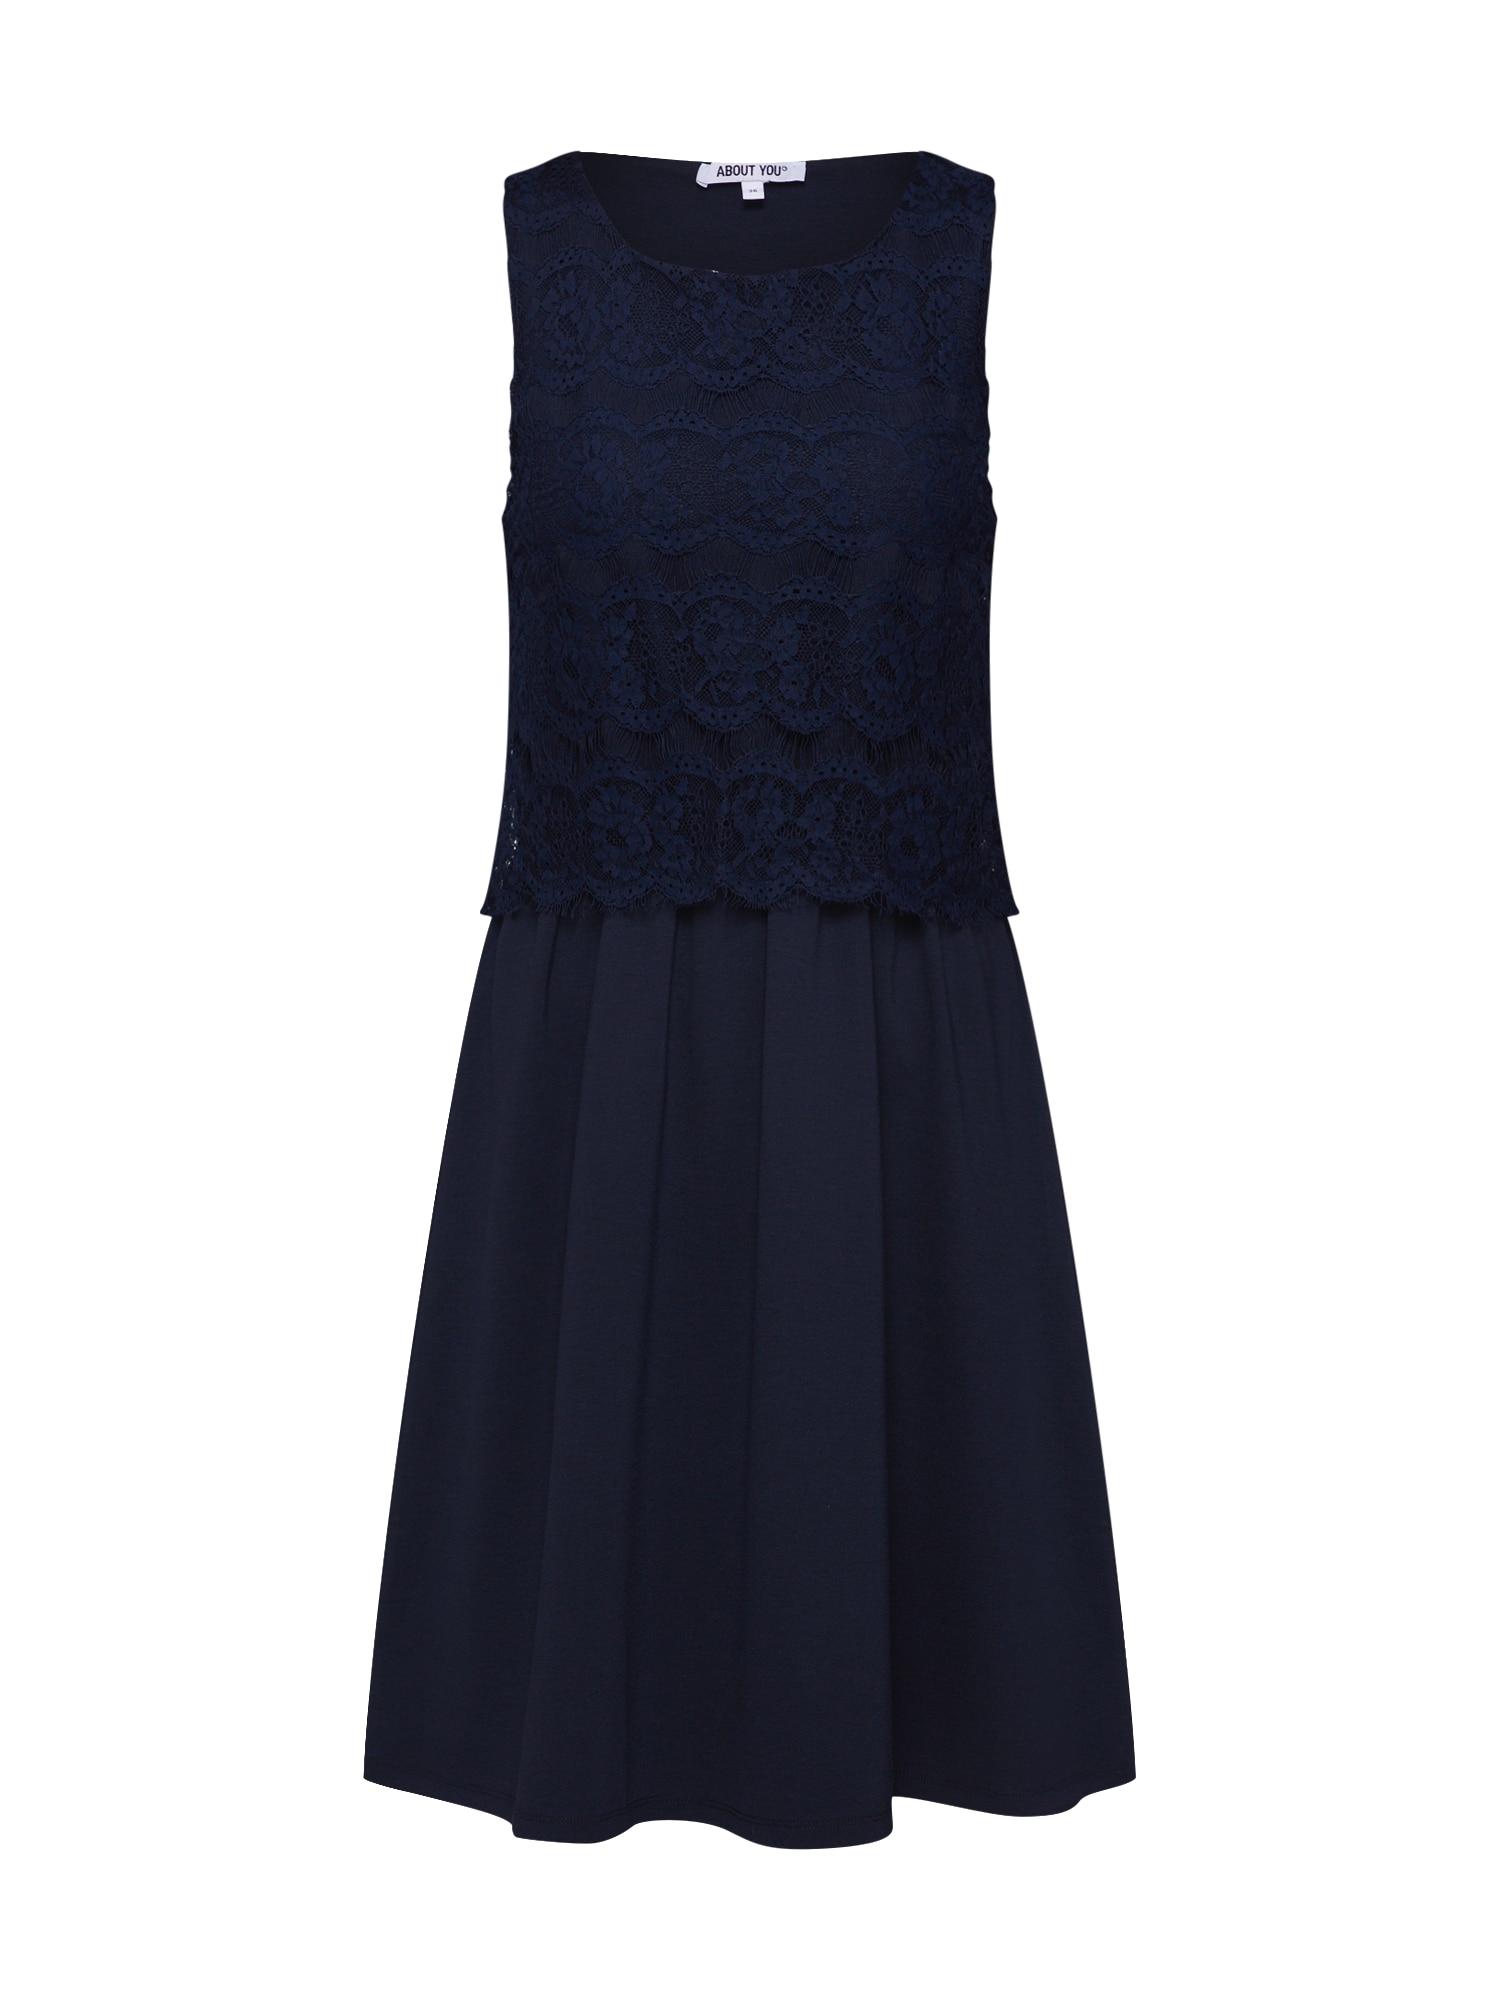 ABOUT YOU Kokteilinė suknelė 'Nona' tamsiai mėlyna